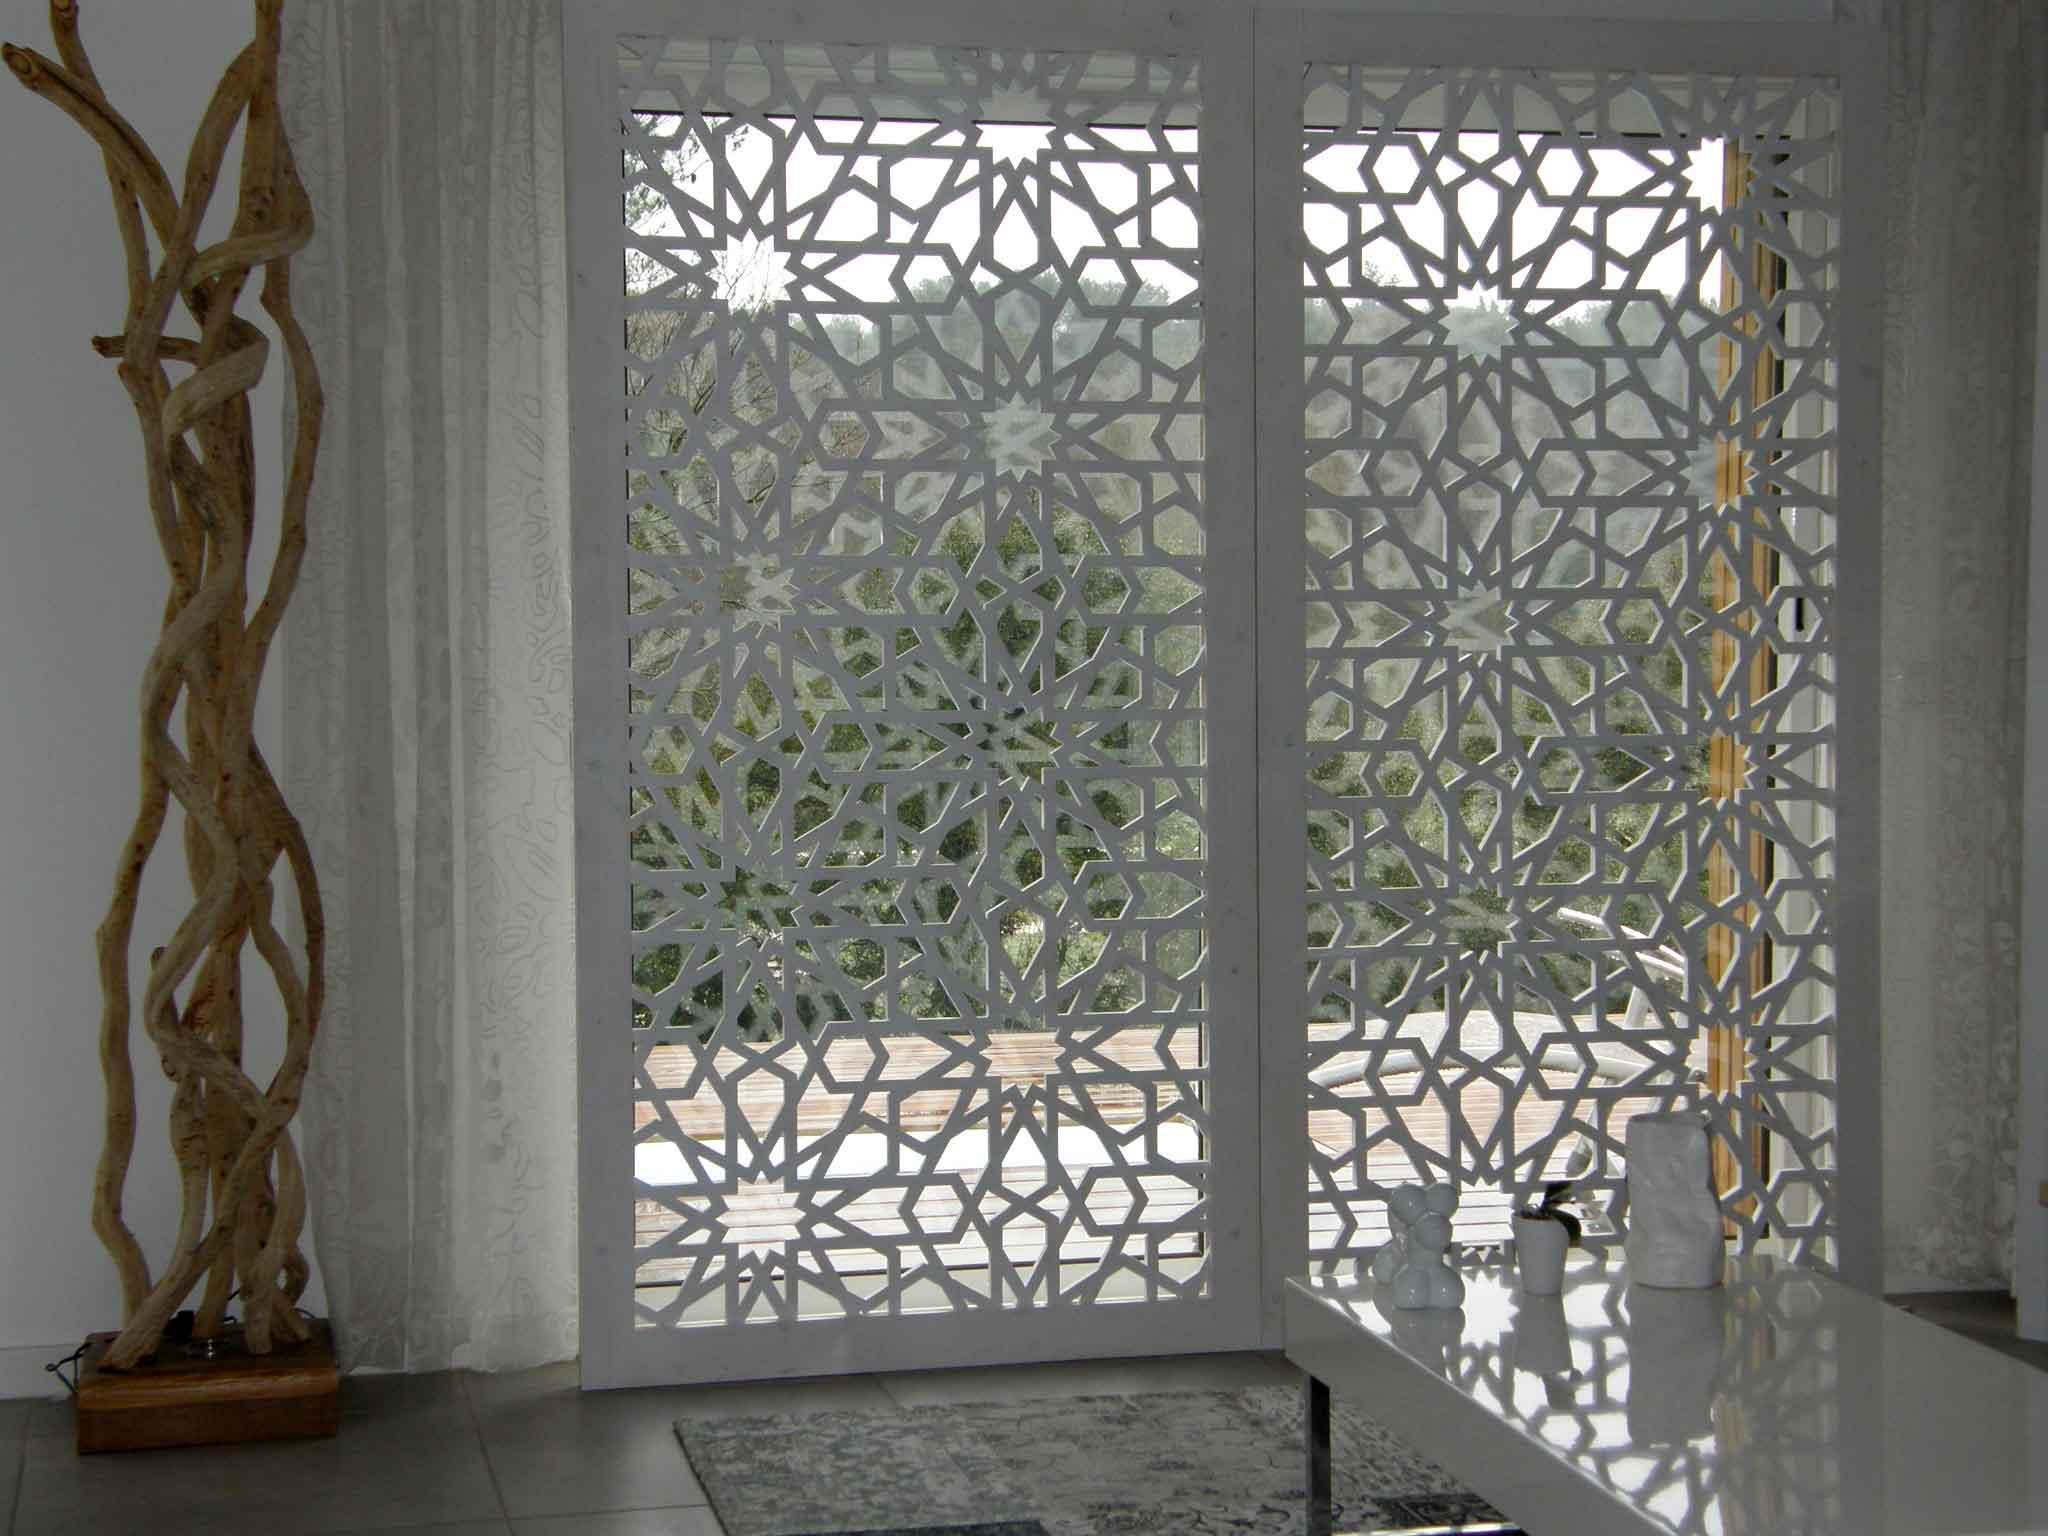 claustra bois helios. Black Bedroom Furniture Sets. Home Design Ideas